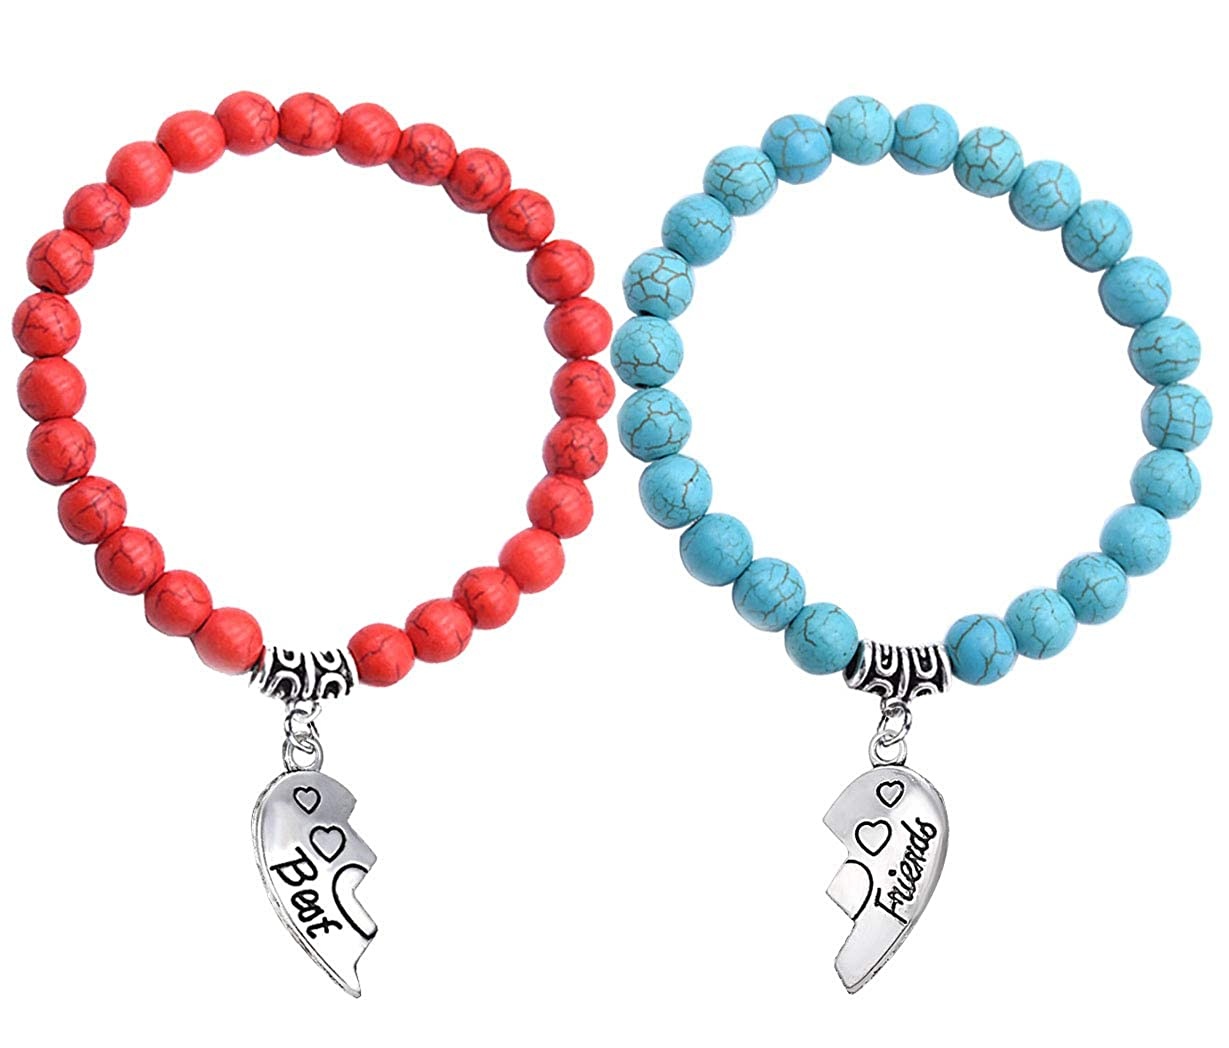 SOOFUN 2PCS Best Friends Bracelets 8mm Elastic Natural Stone Yoga Bracelet,Soul Sisters Friendship Charm,Christmas Birthday Gift